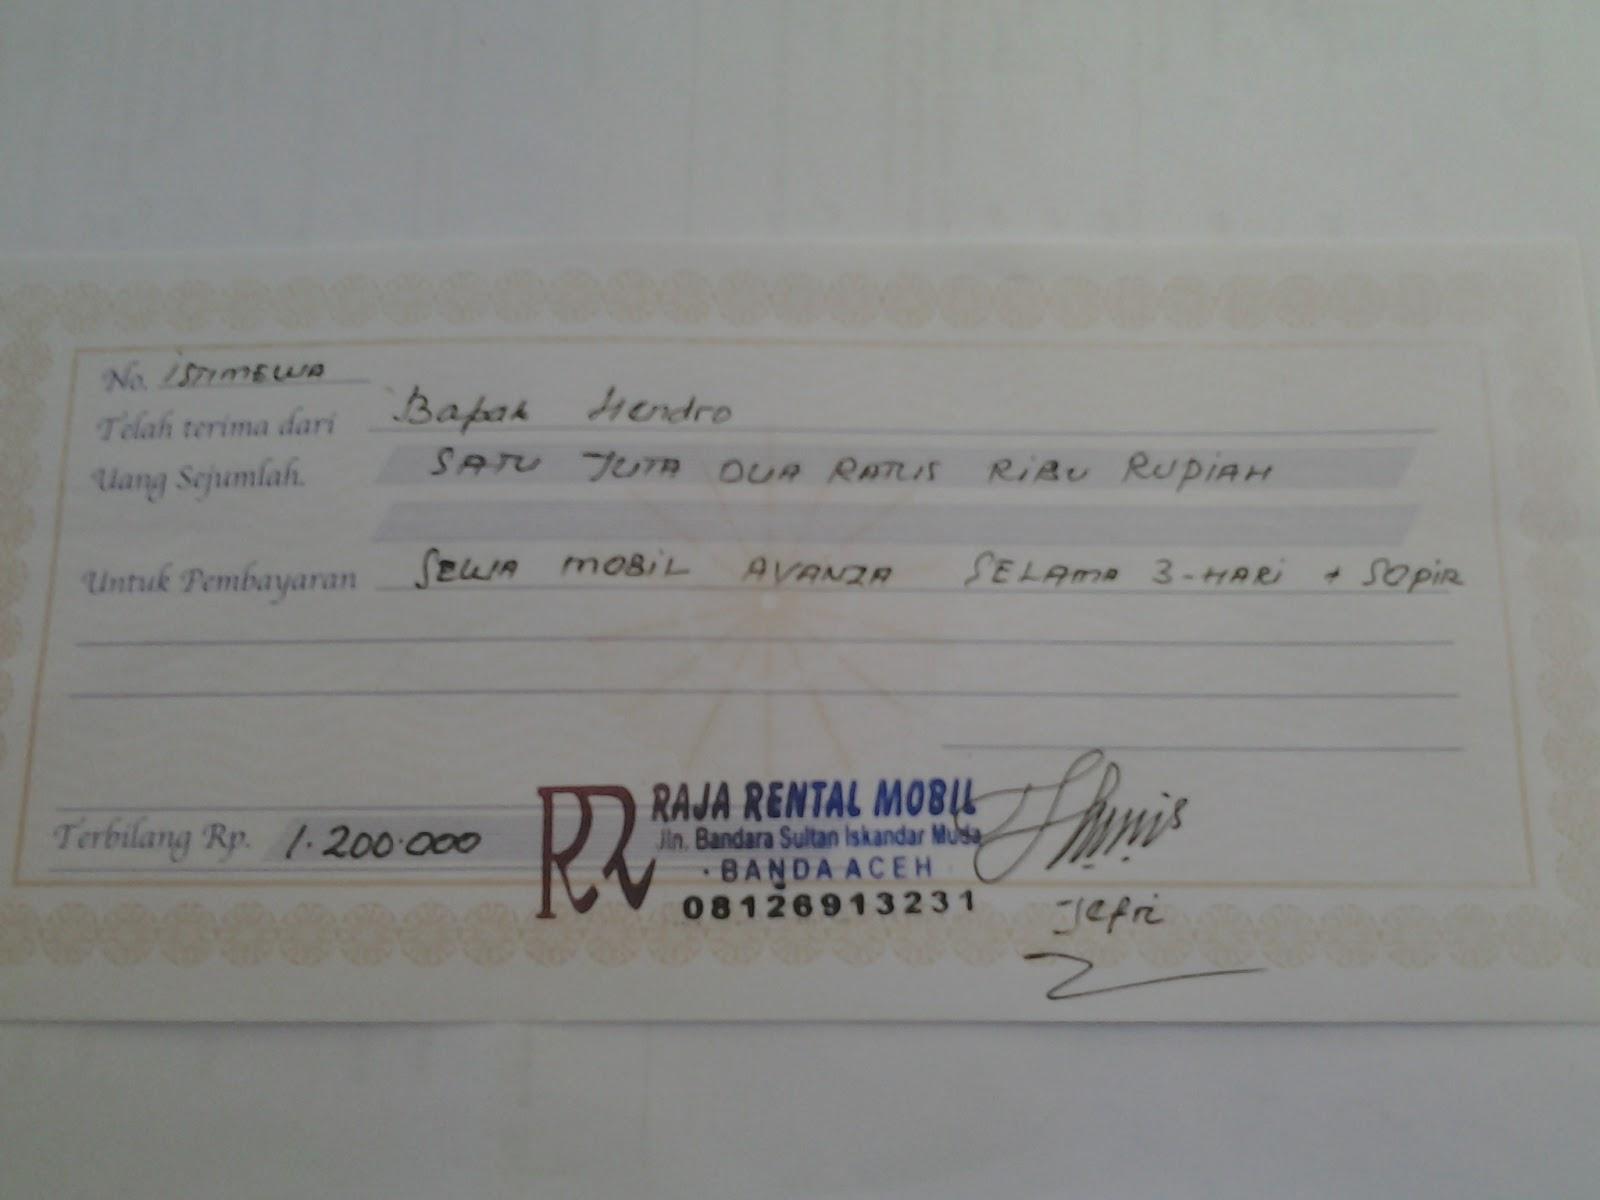 Rental Mobil Aceh Nota Pembayaran